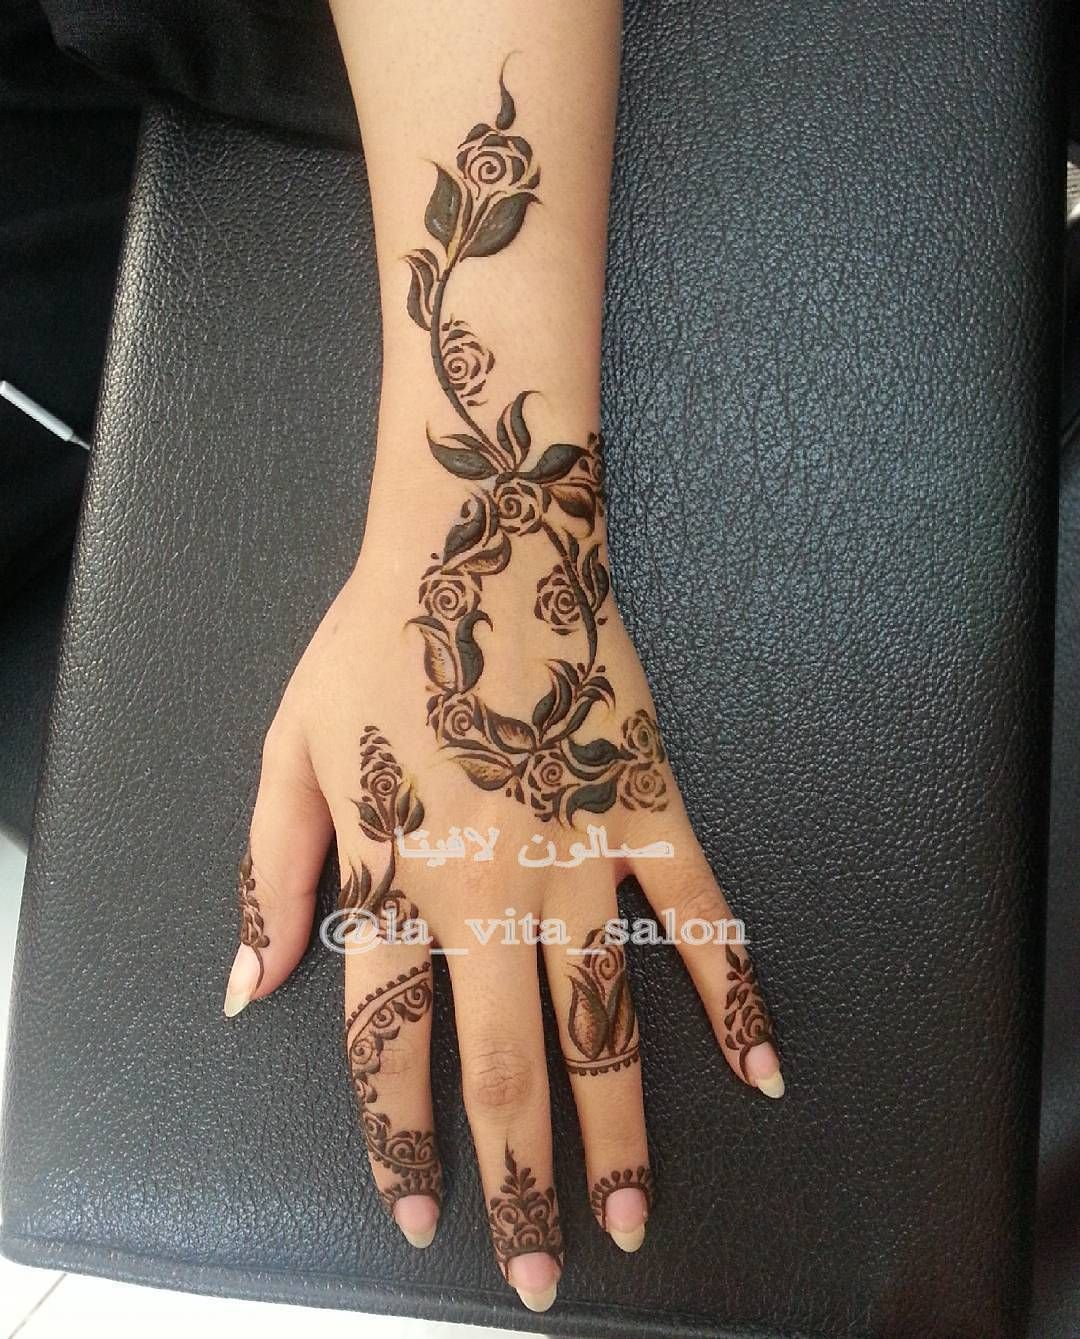 Beauty On Instagram حناء حنايات الحناء رسم نقش فن موضه ديزاين الامارات ابوظبي مشاركه دبي ت Henna Designs Hand Latest Mehndi Designs Henna Tattoo Designs